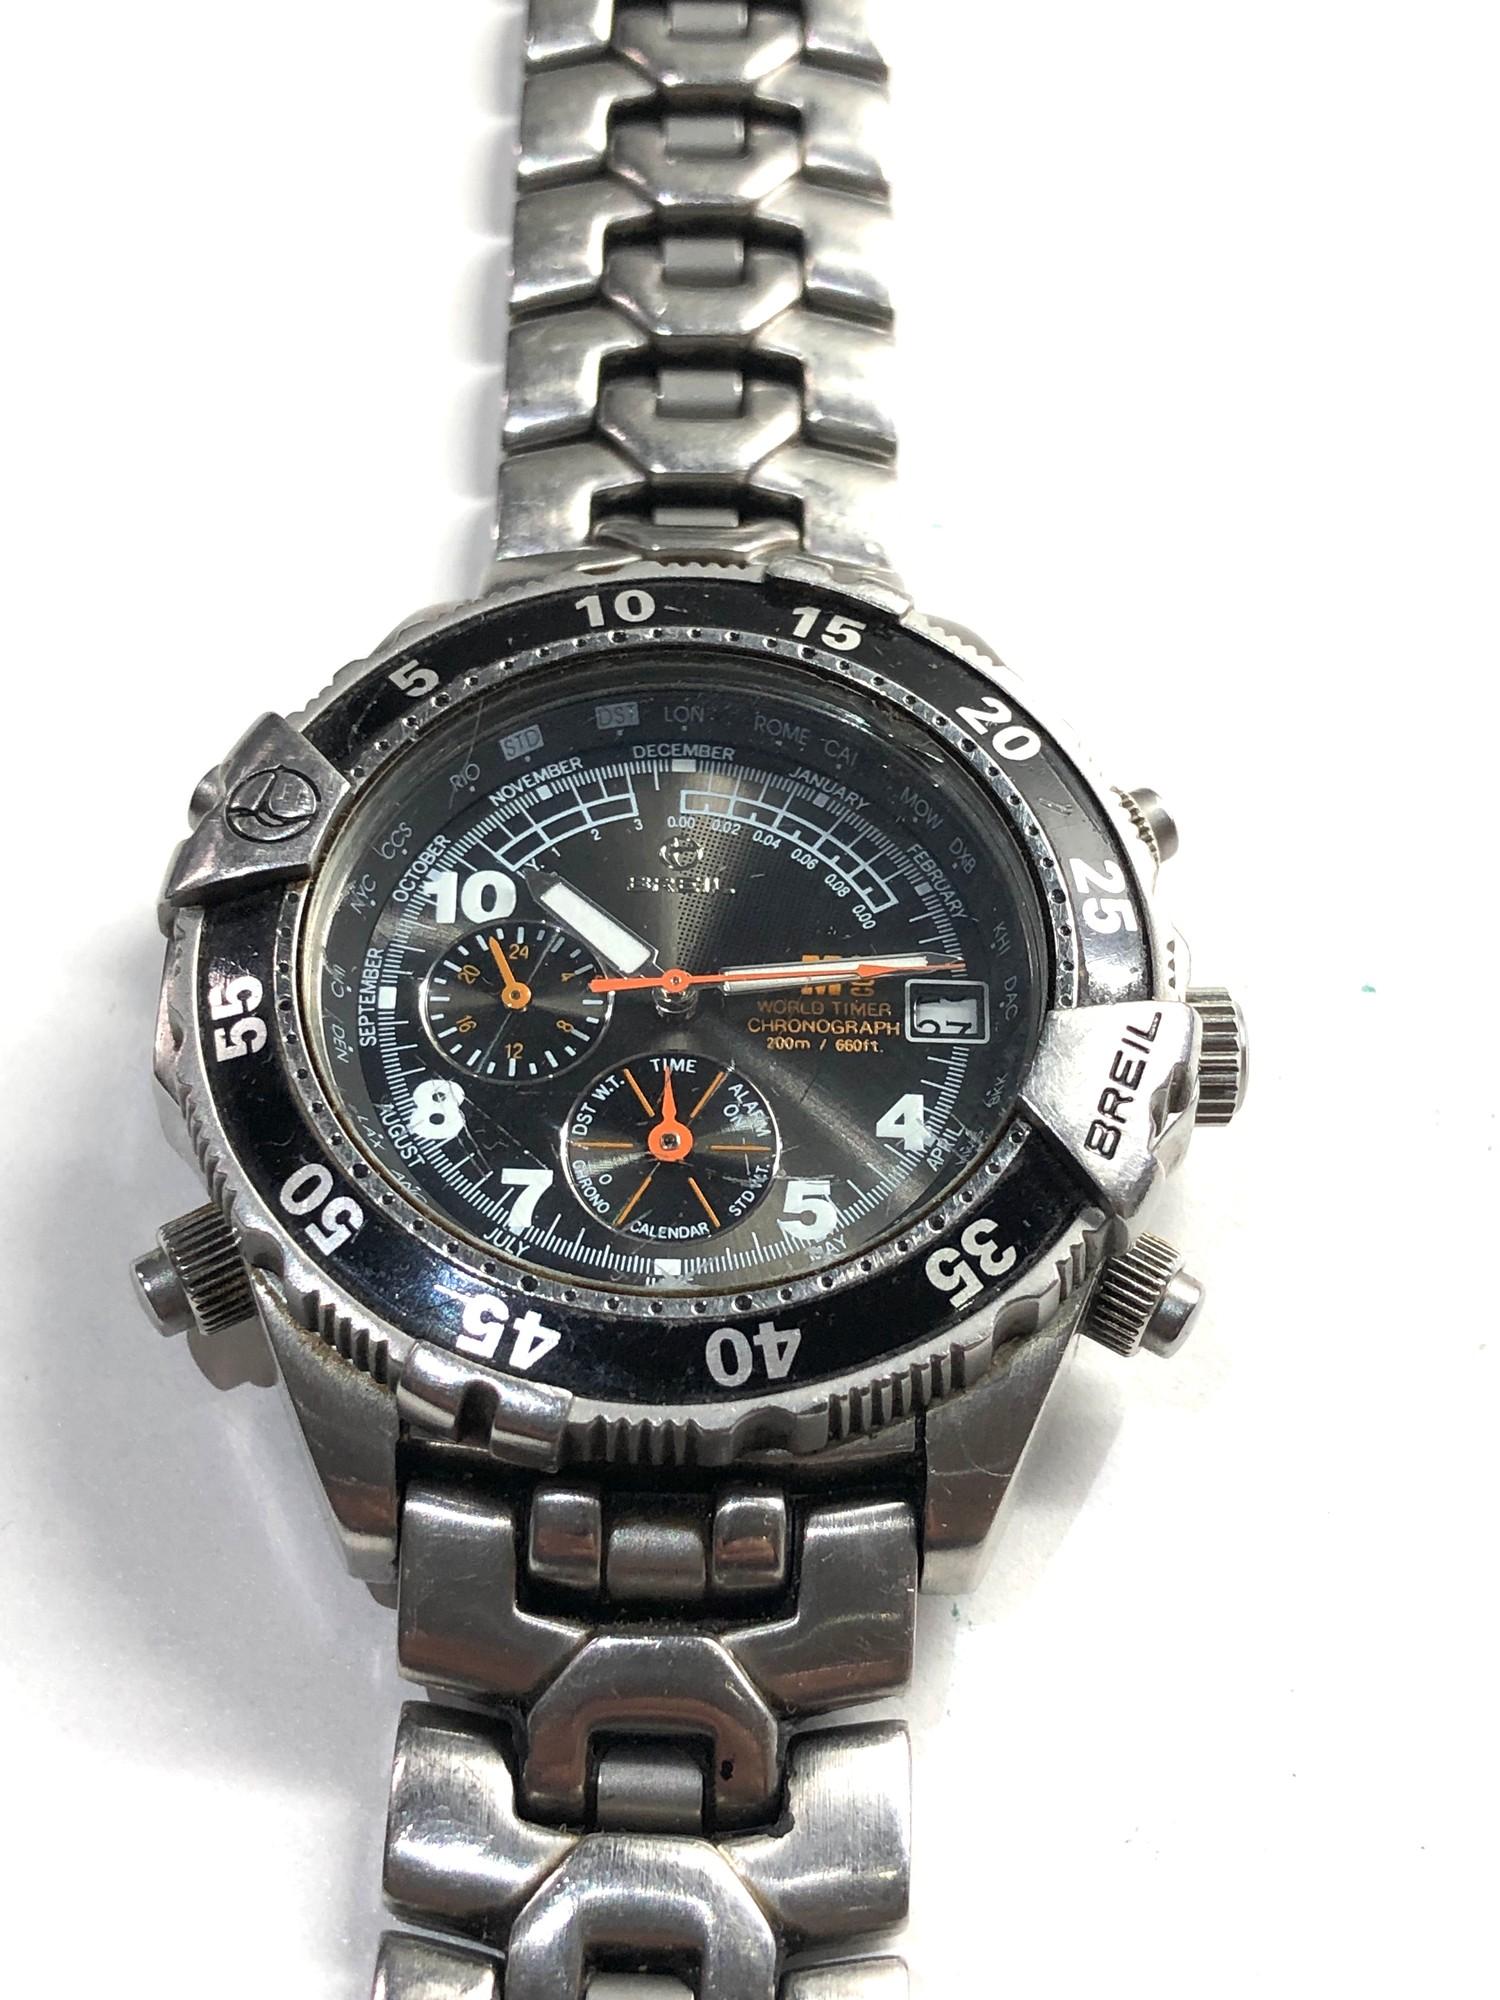 Gents Breil world timer chronograph wristwatch spares or repair